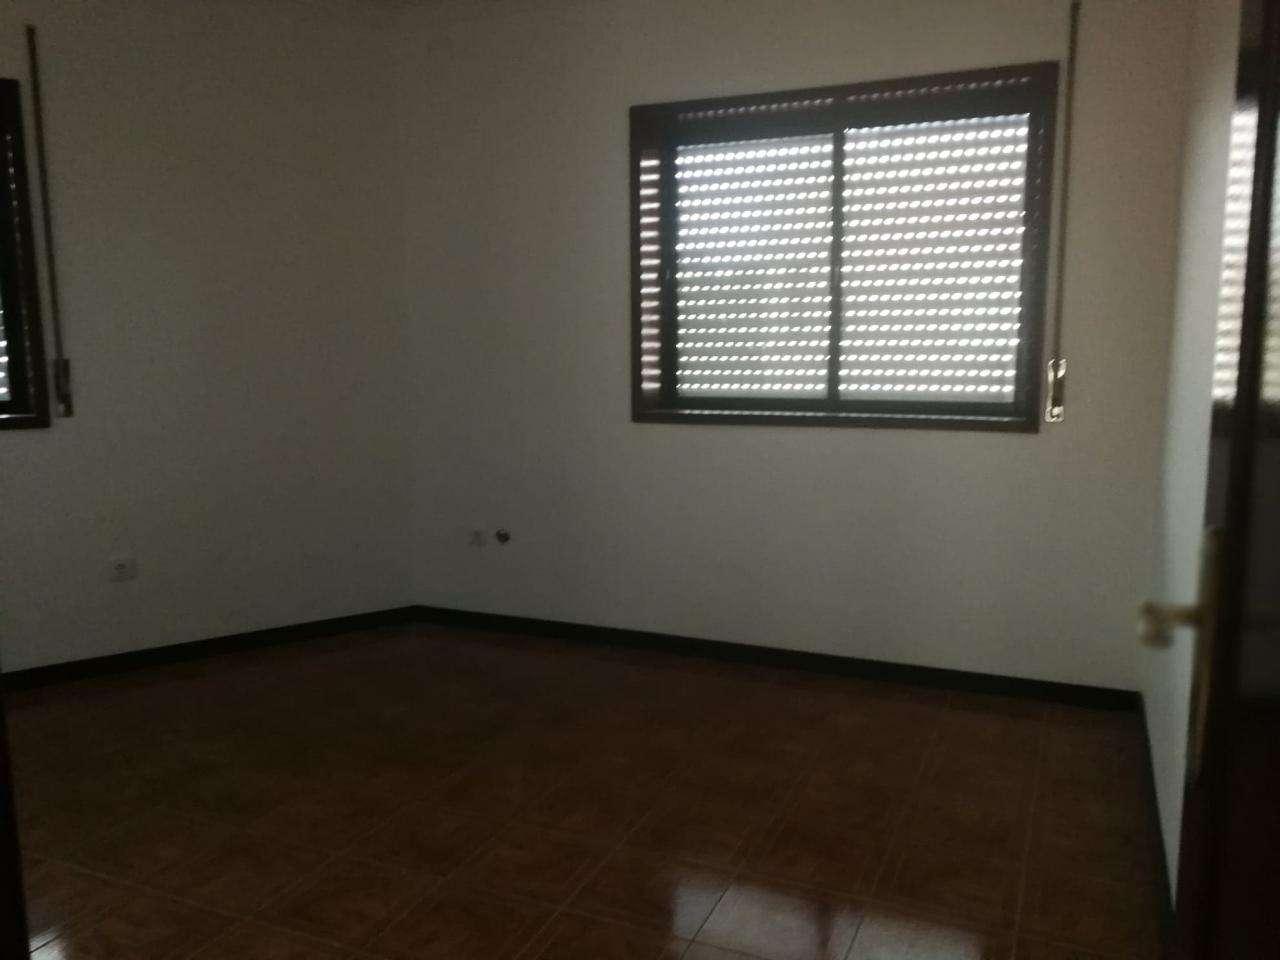 Apartamento para comprar, Vilela, Paredes, Porto - Foto 3